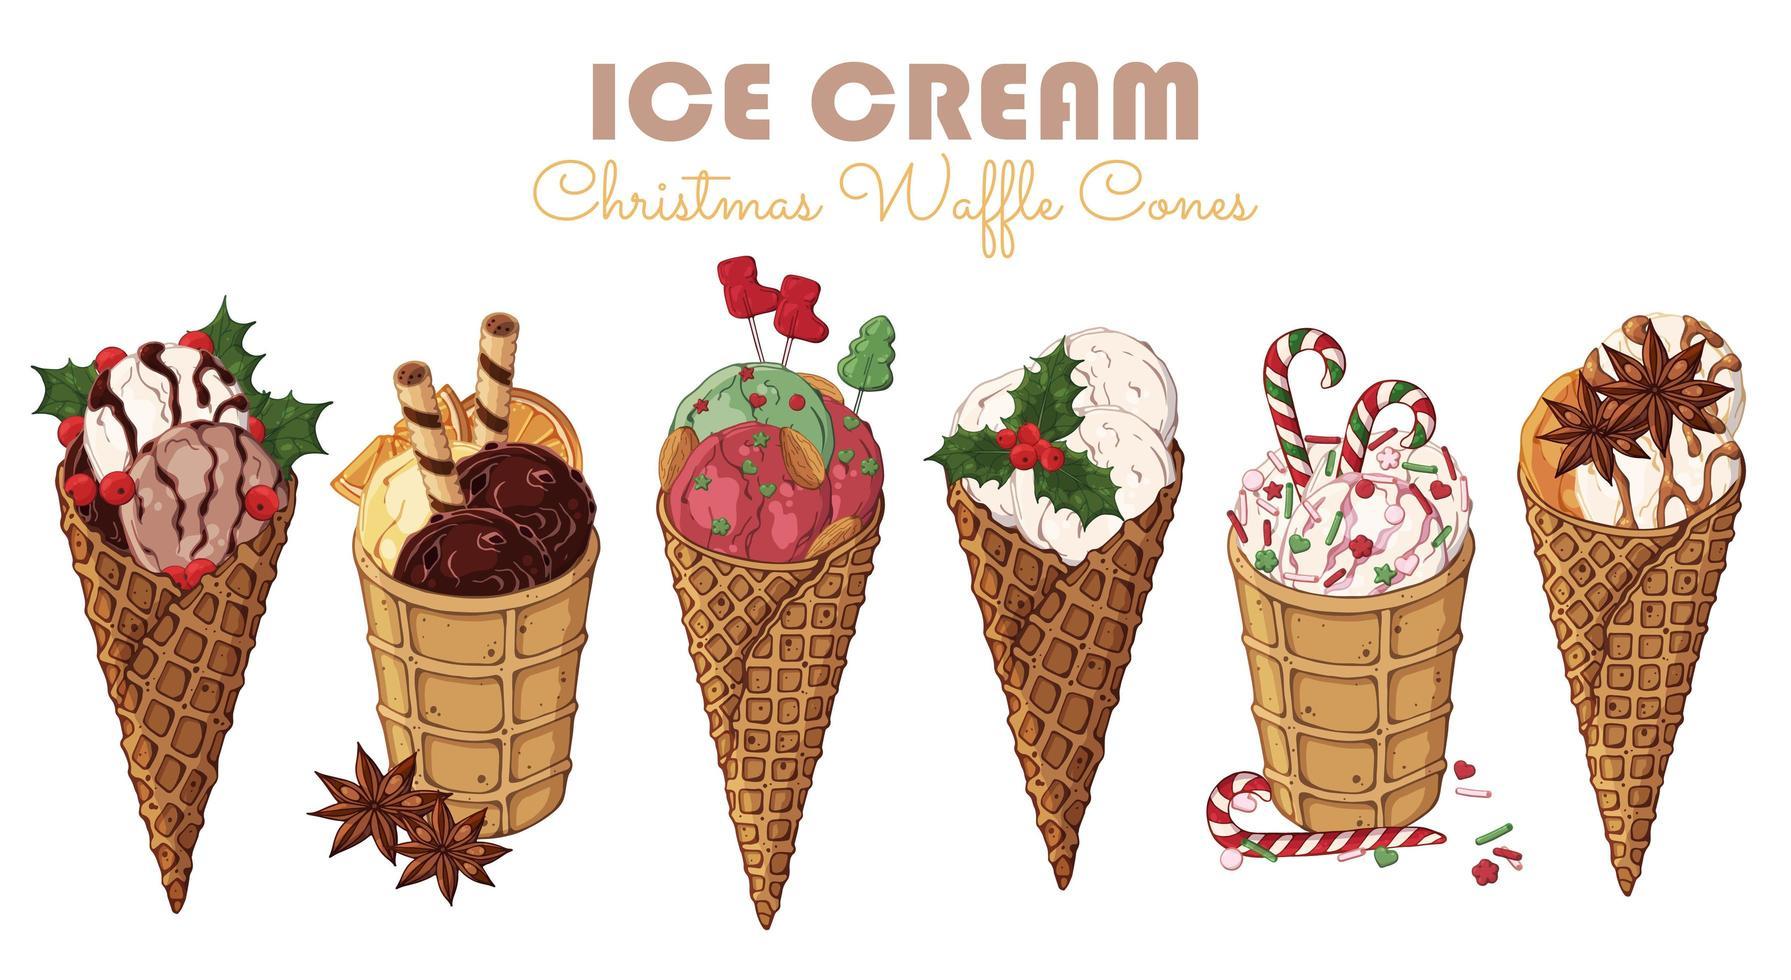 Conjunto de temas de doces de natal de diferentes tipos de sorvete em cones de waffle vetor